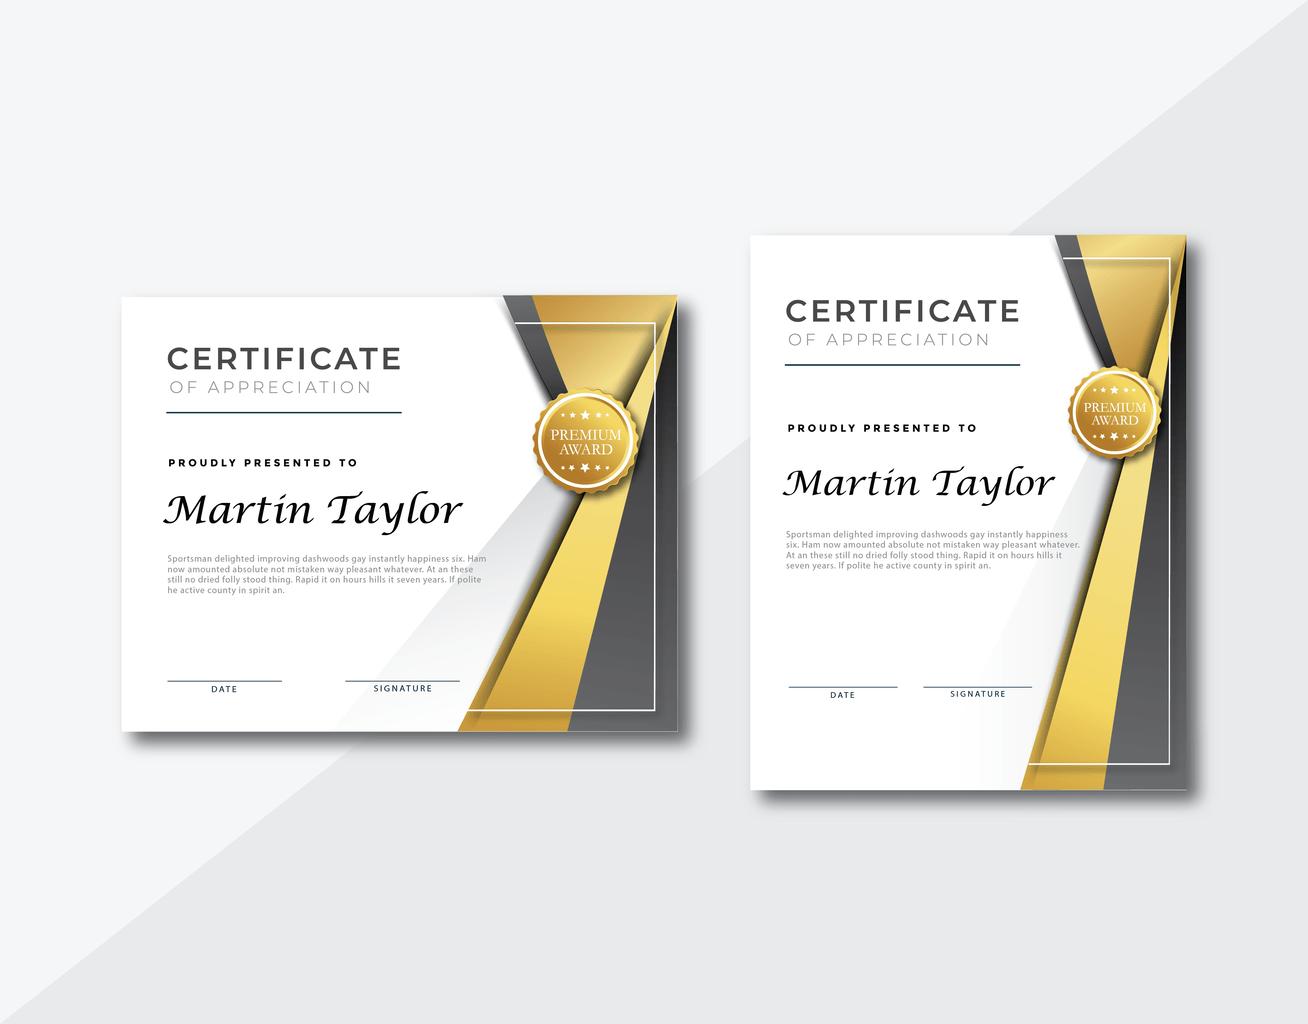 certificate regular awards